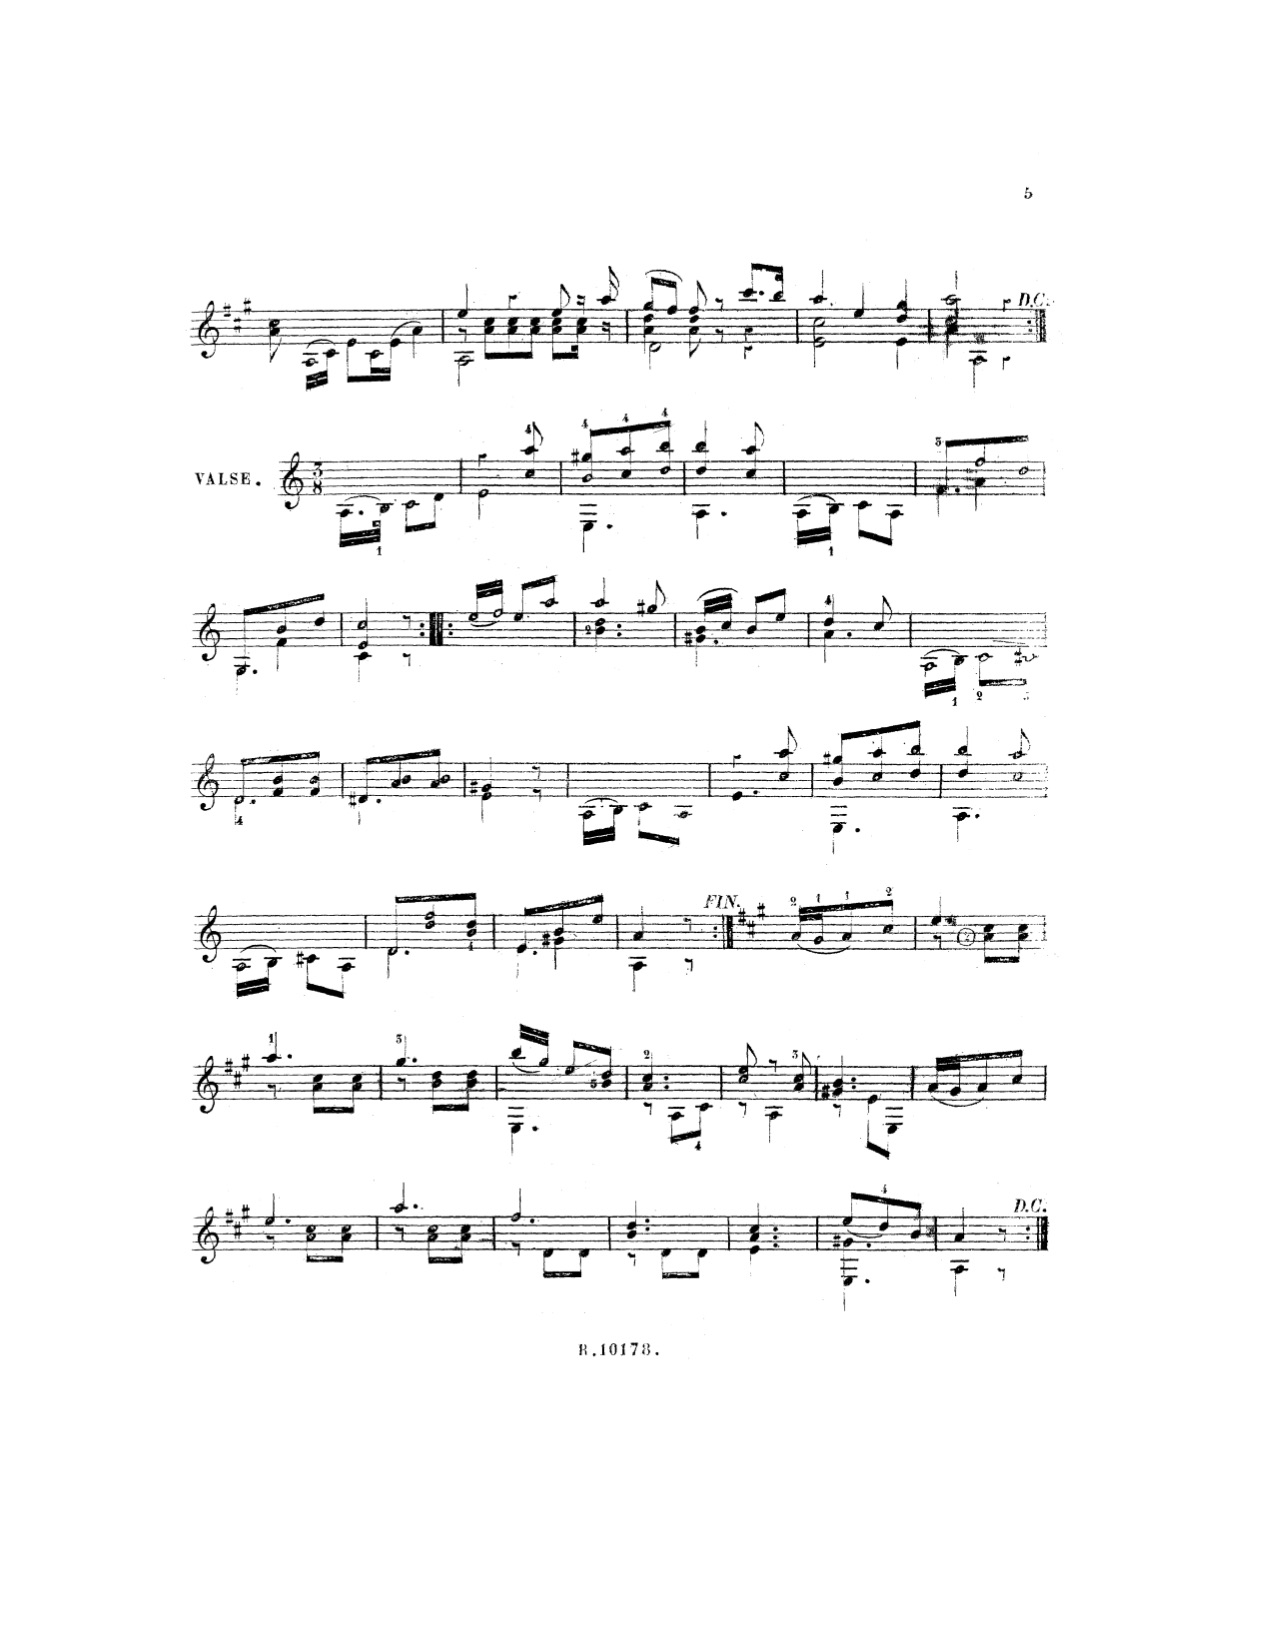 Aguado Op. 13 Morceaux Agreables 5.jpg